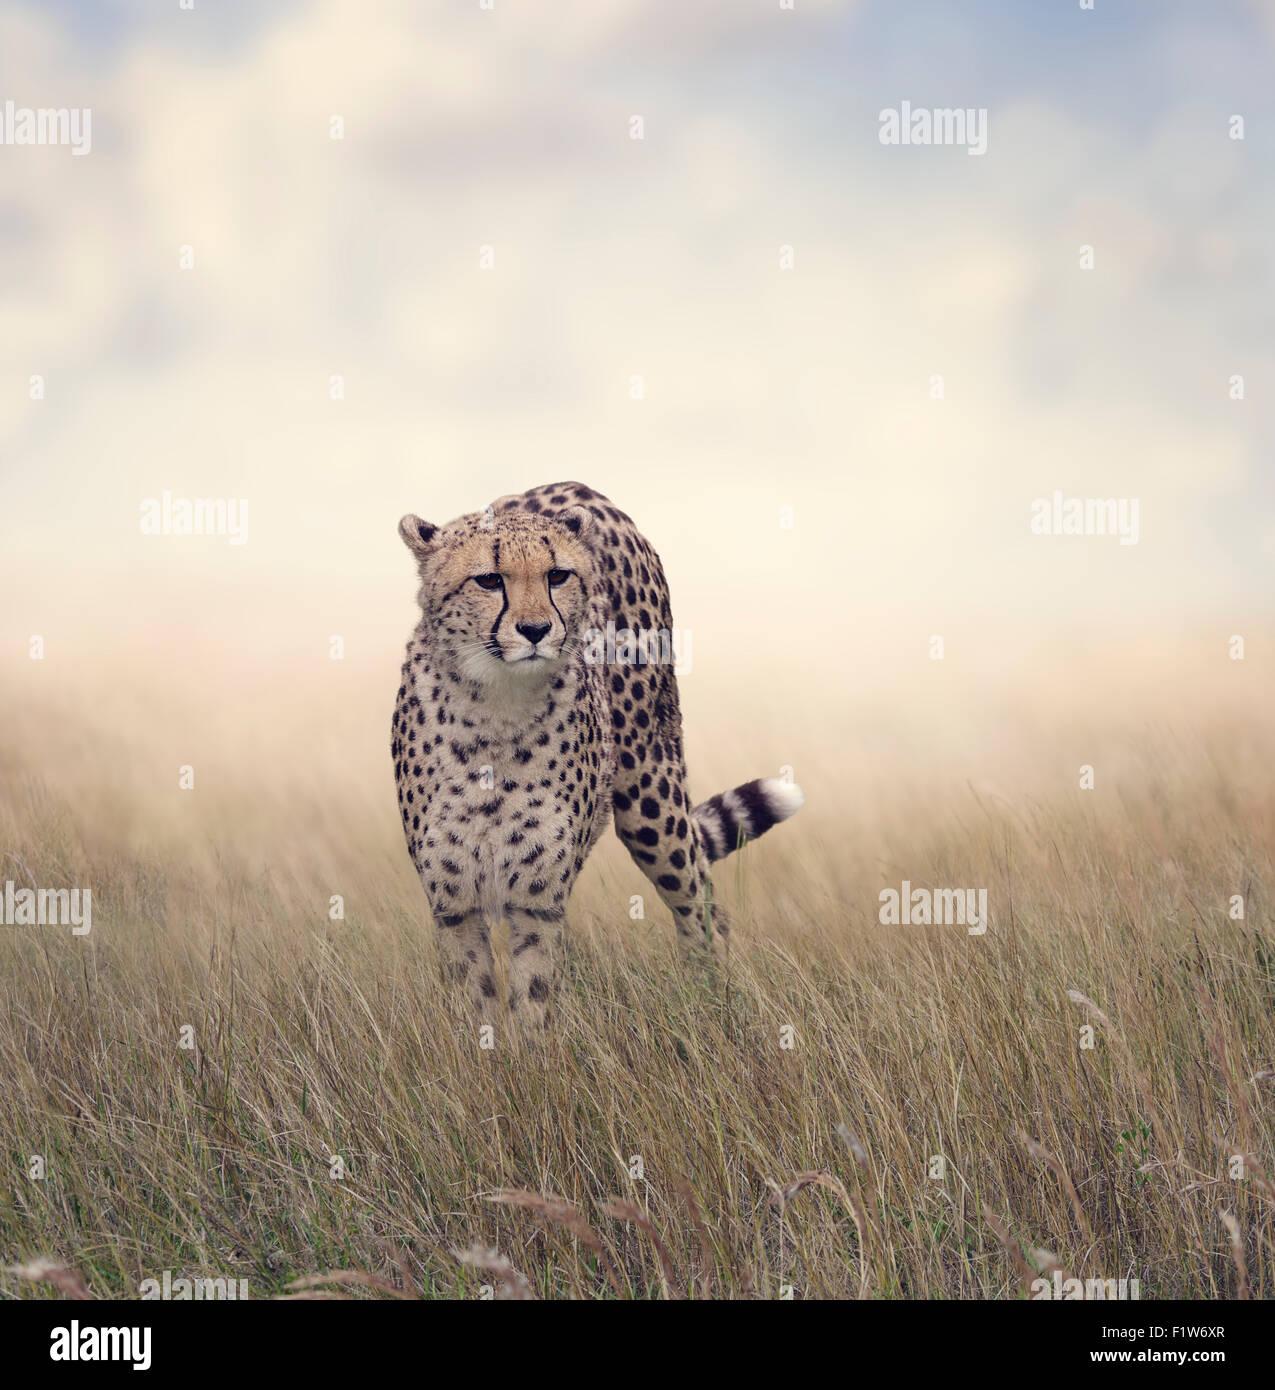 Cheetah Walking in The Grassland - Stock Image